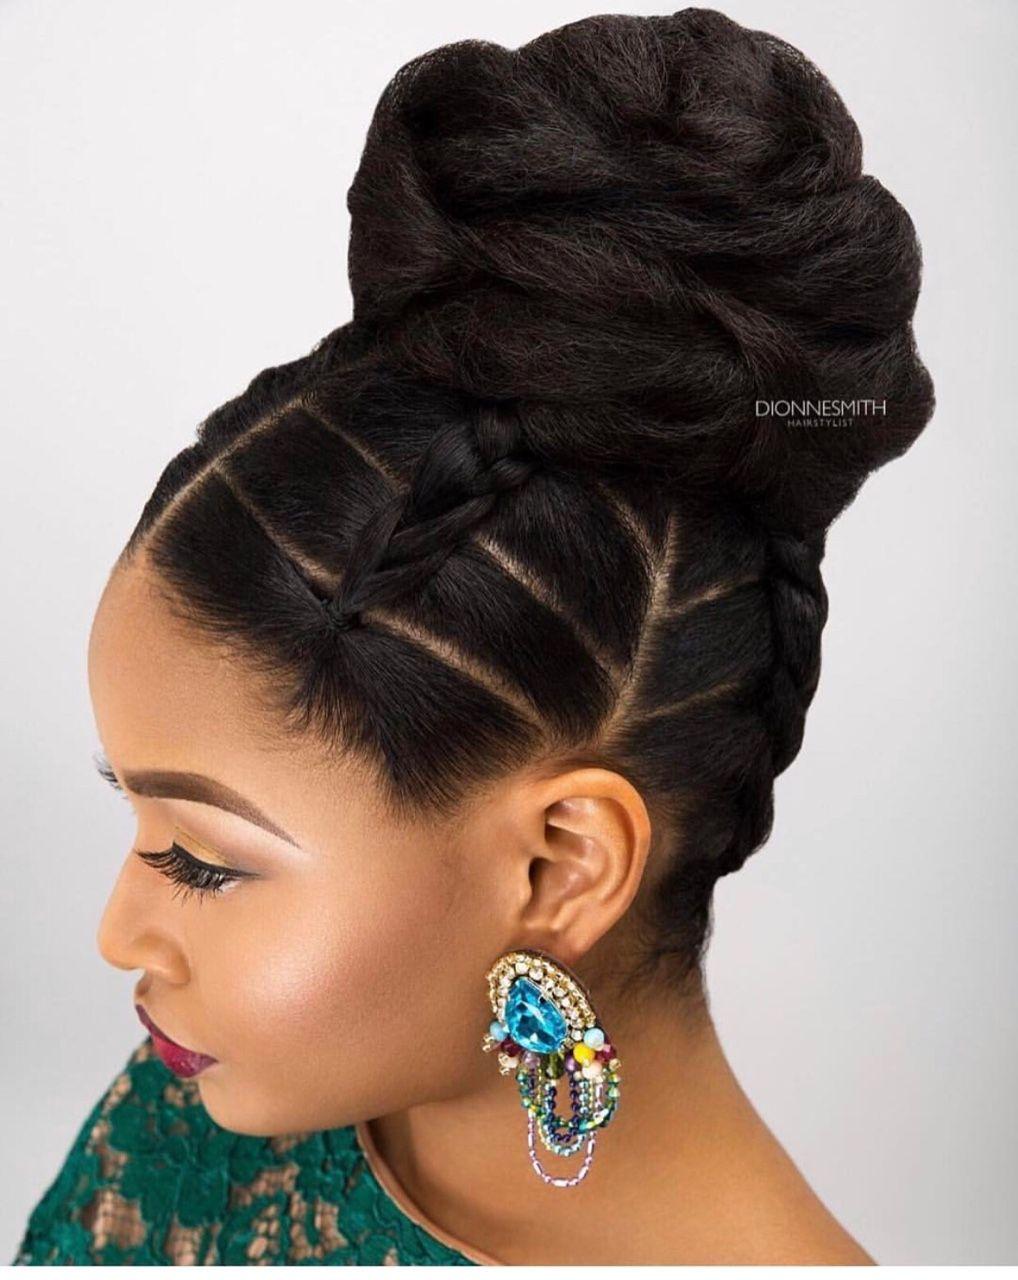 Simple But Elegant Follow For More Styles Www Yeahsexyweaves Tumblr Com Natural Hair Bun Styles Natural Hair Updo Natural Hair Styles